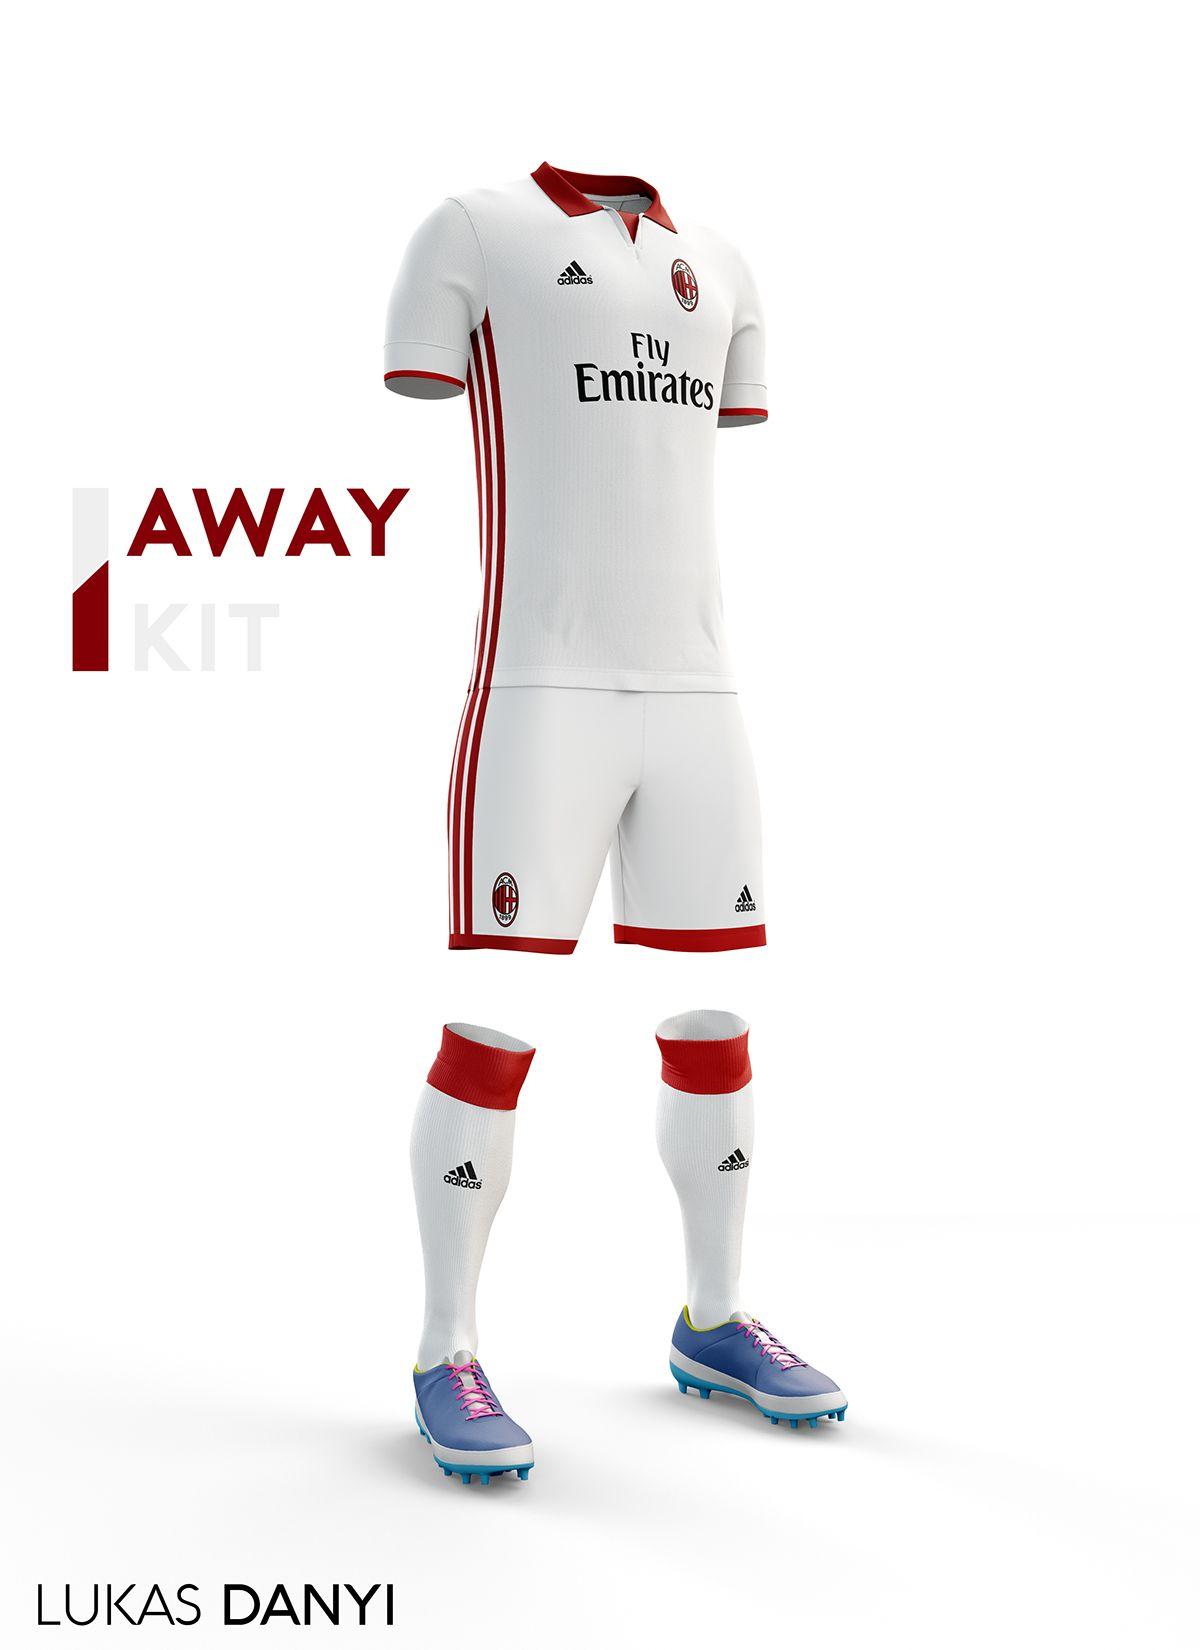 512x512 galatasaray home kit pictures free download - Milan Football Kit 16 17 On Behance